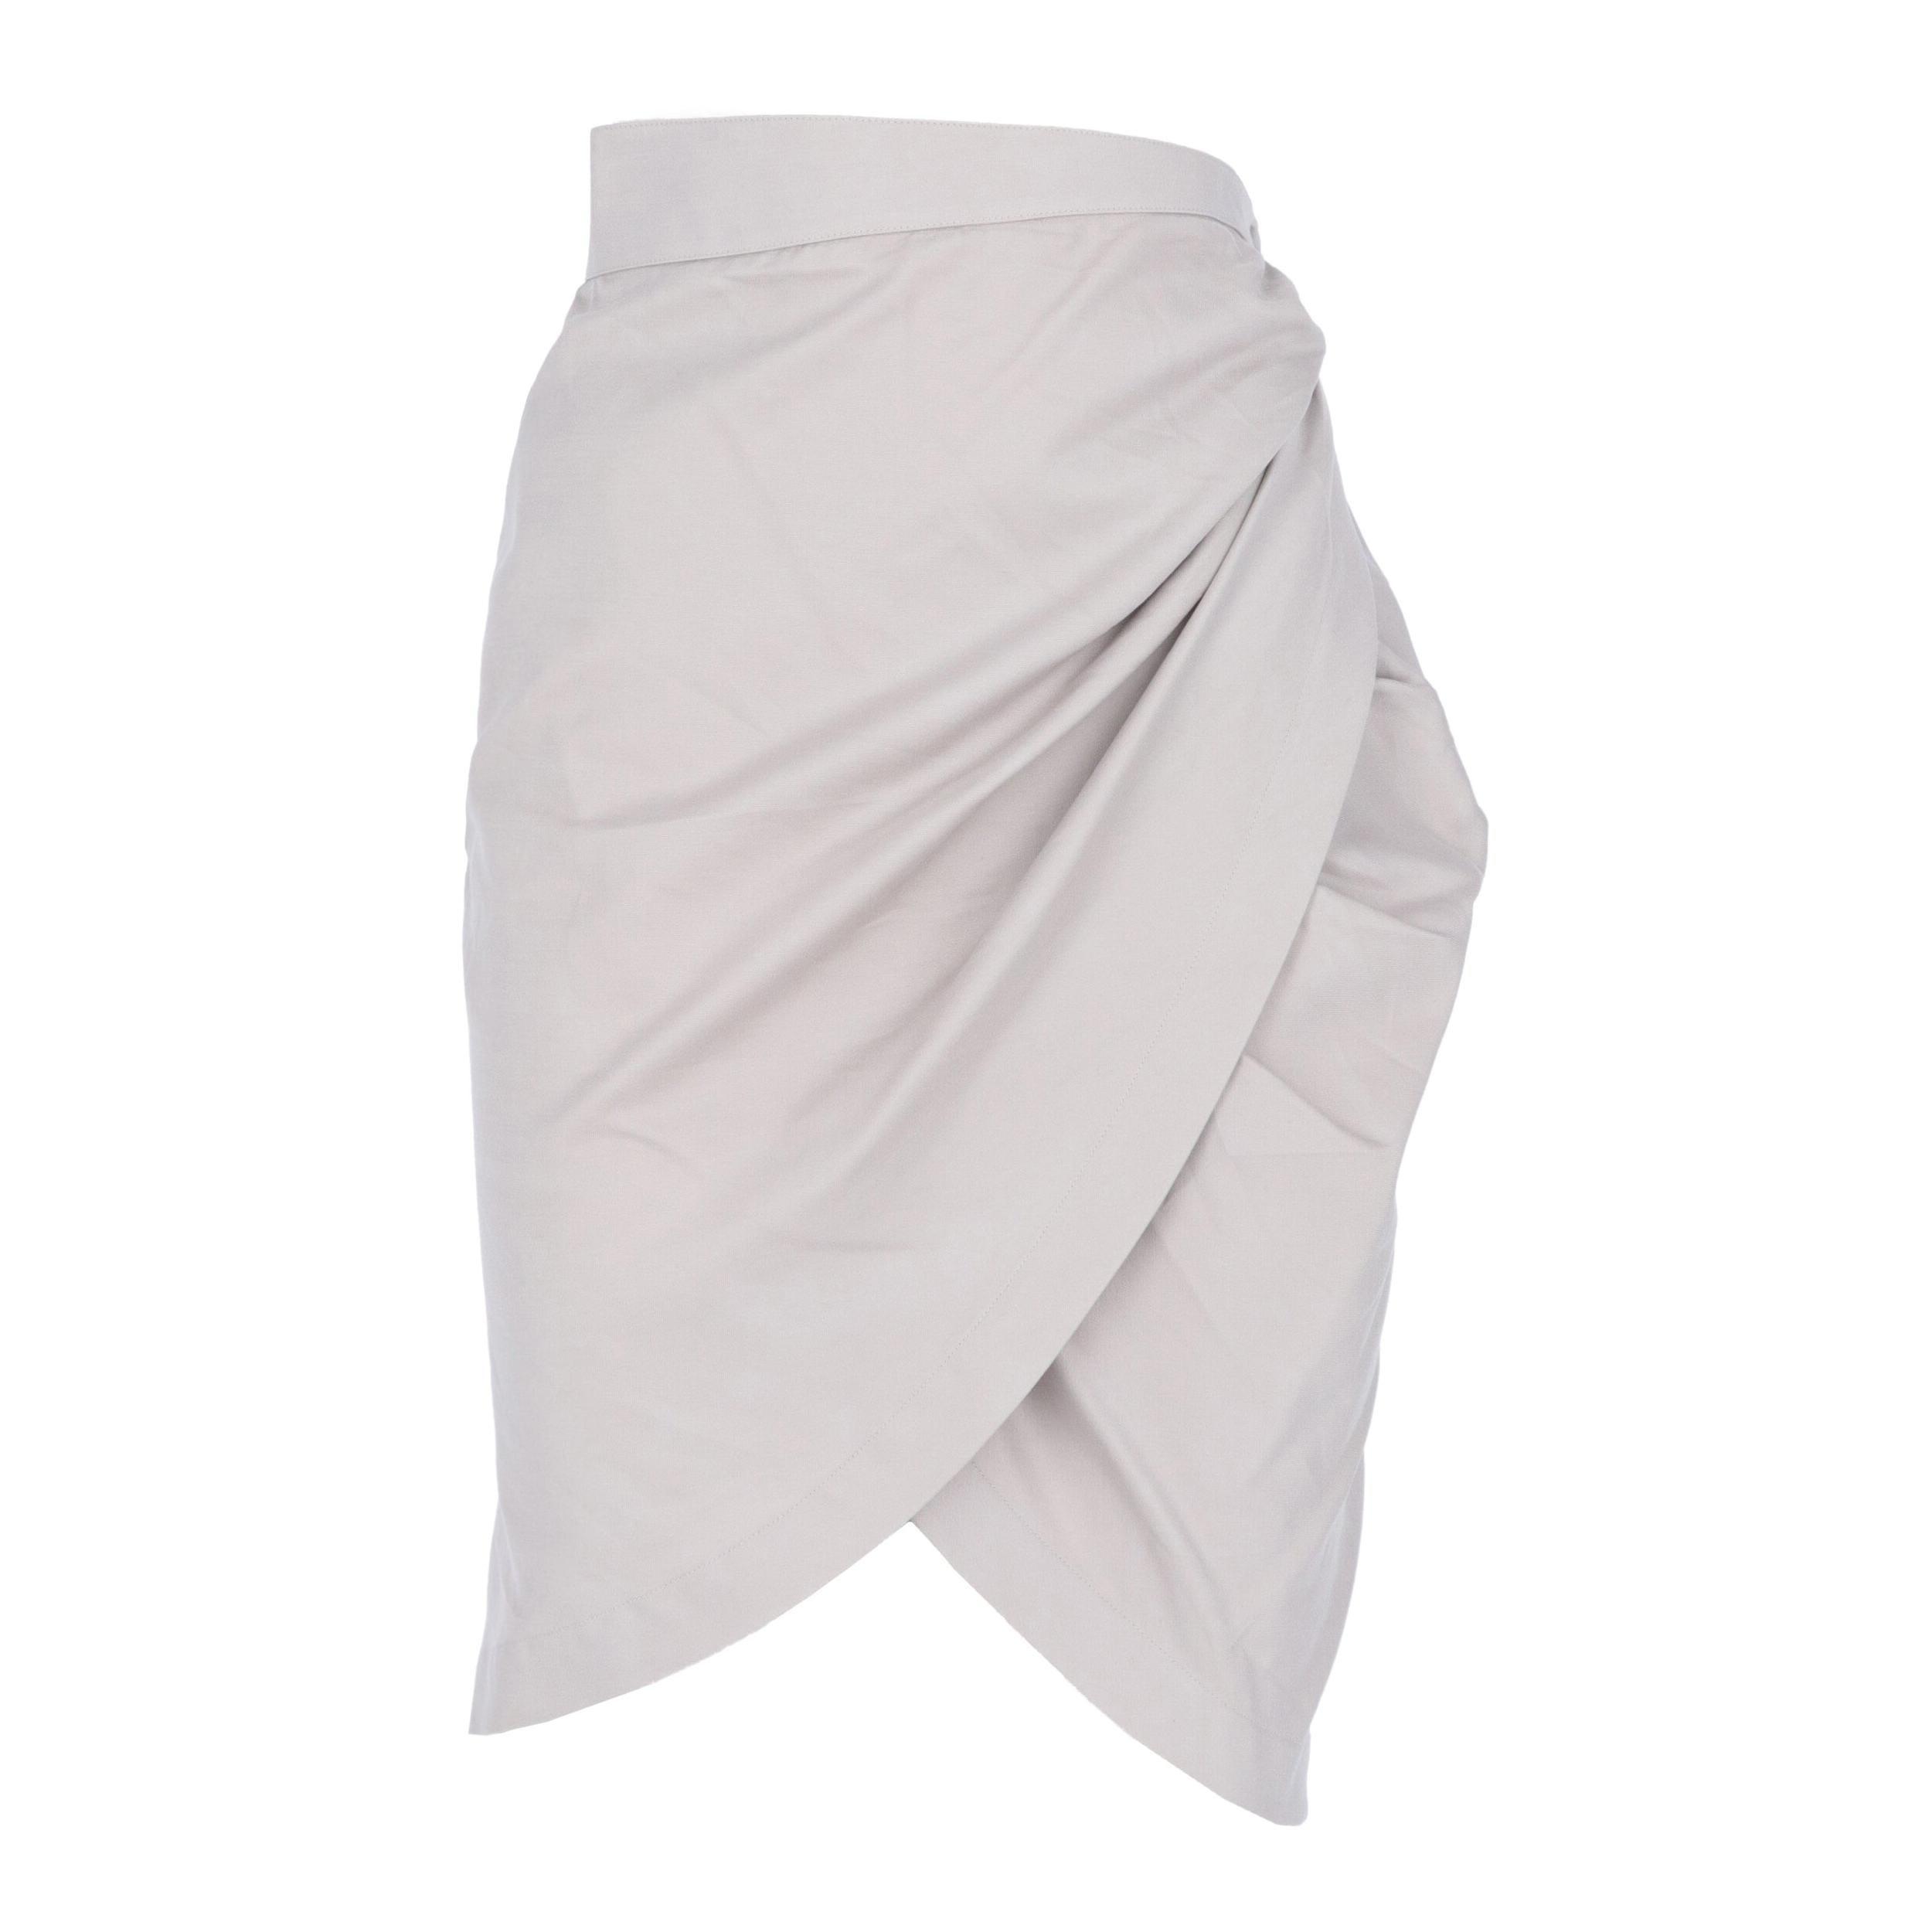 1980s Thierry Mugler Wrap Skirt